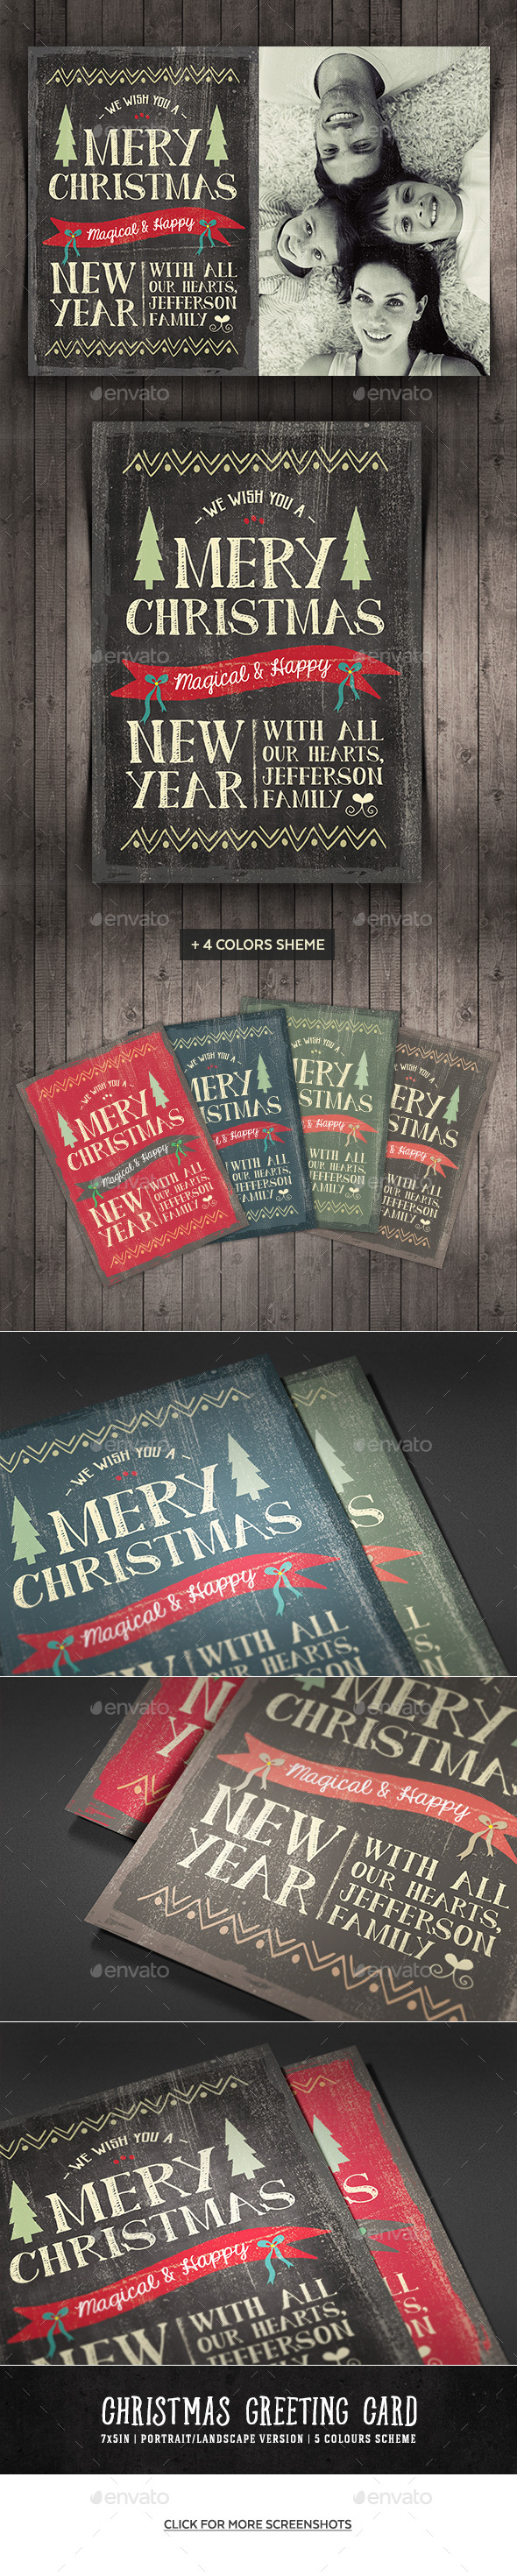 Vintage Christmas Greeting Card - Holiday Greeting Cards